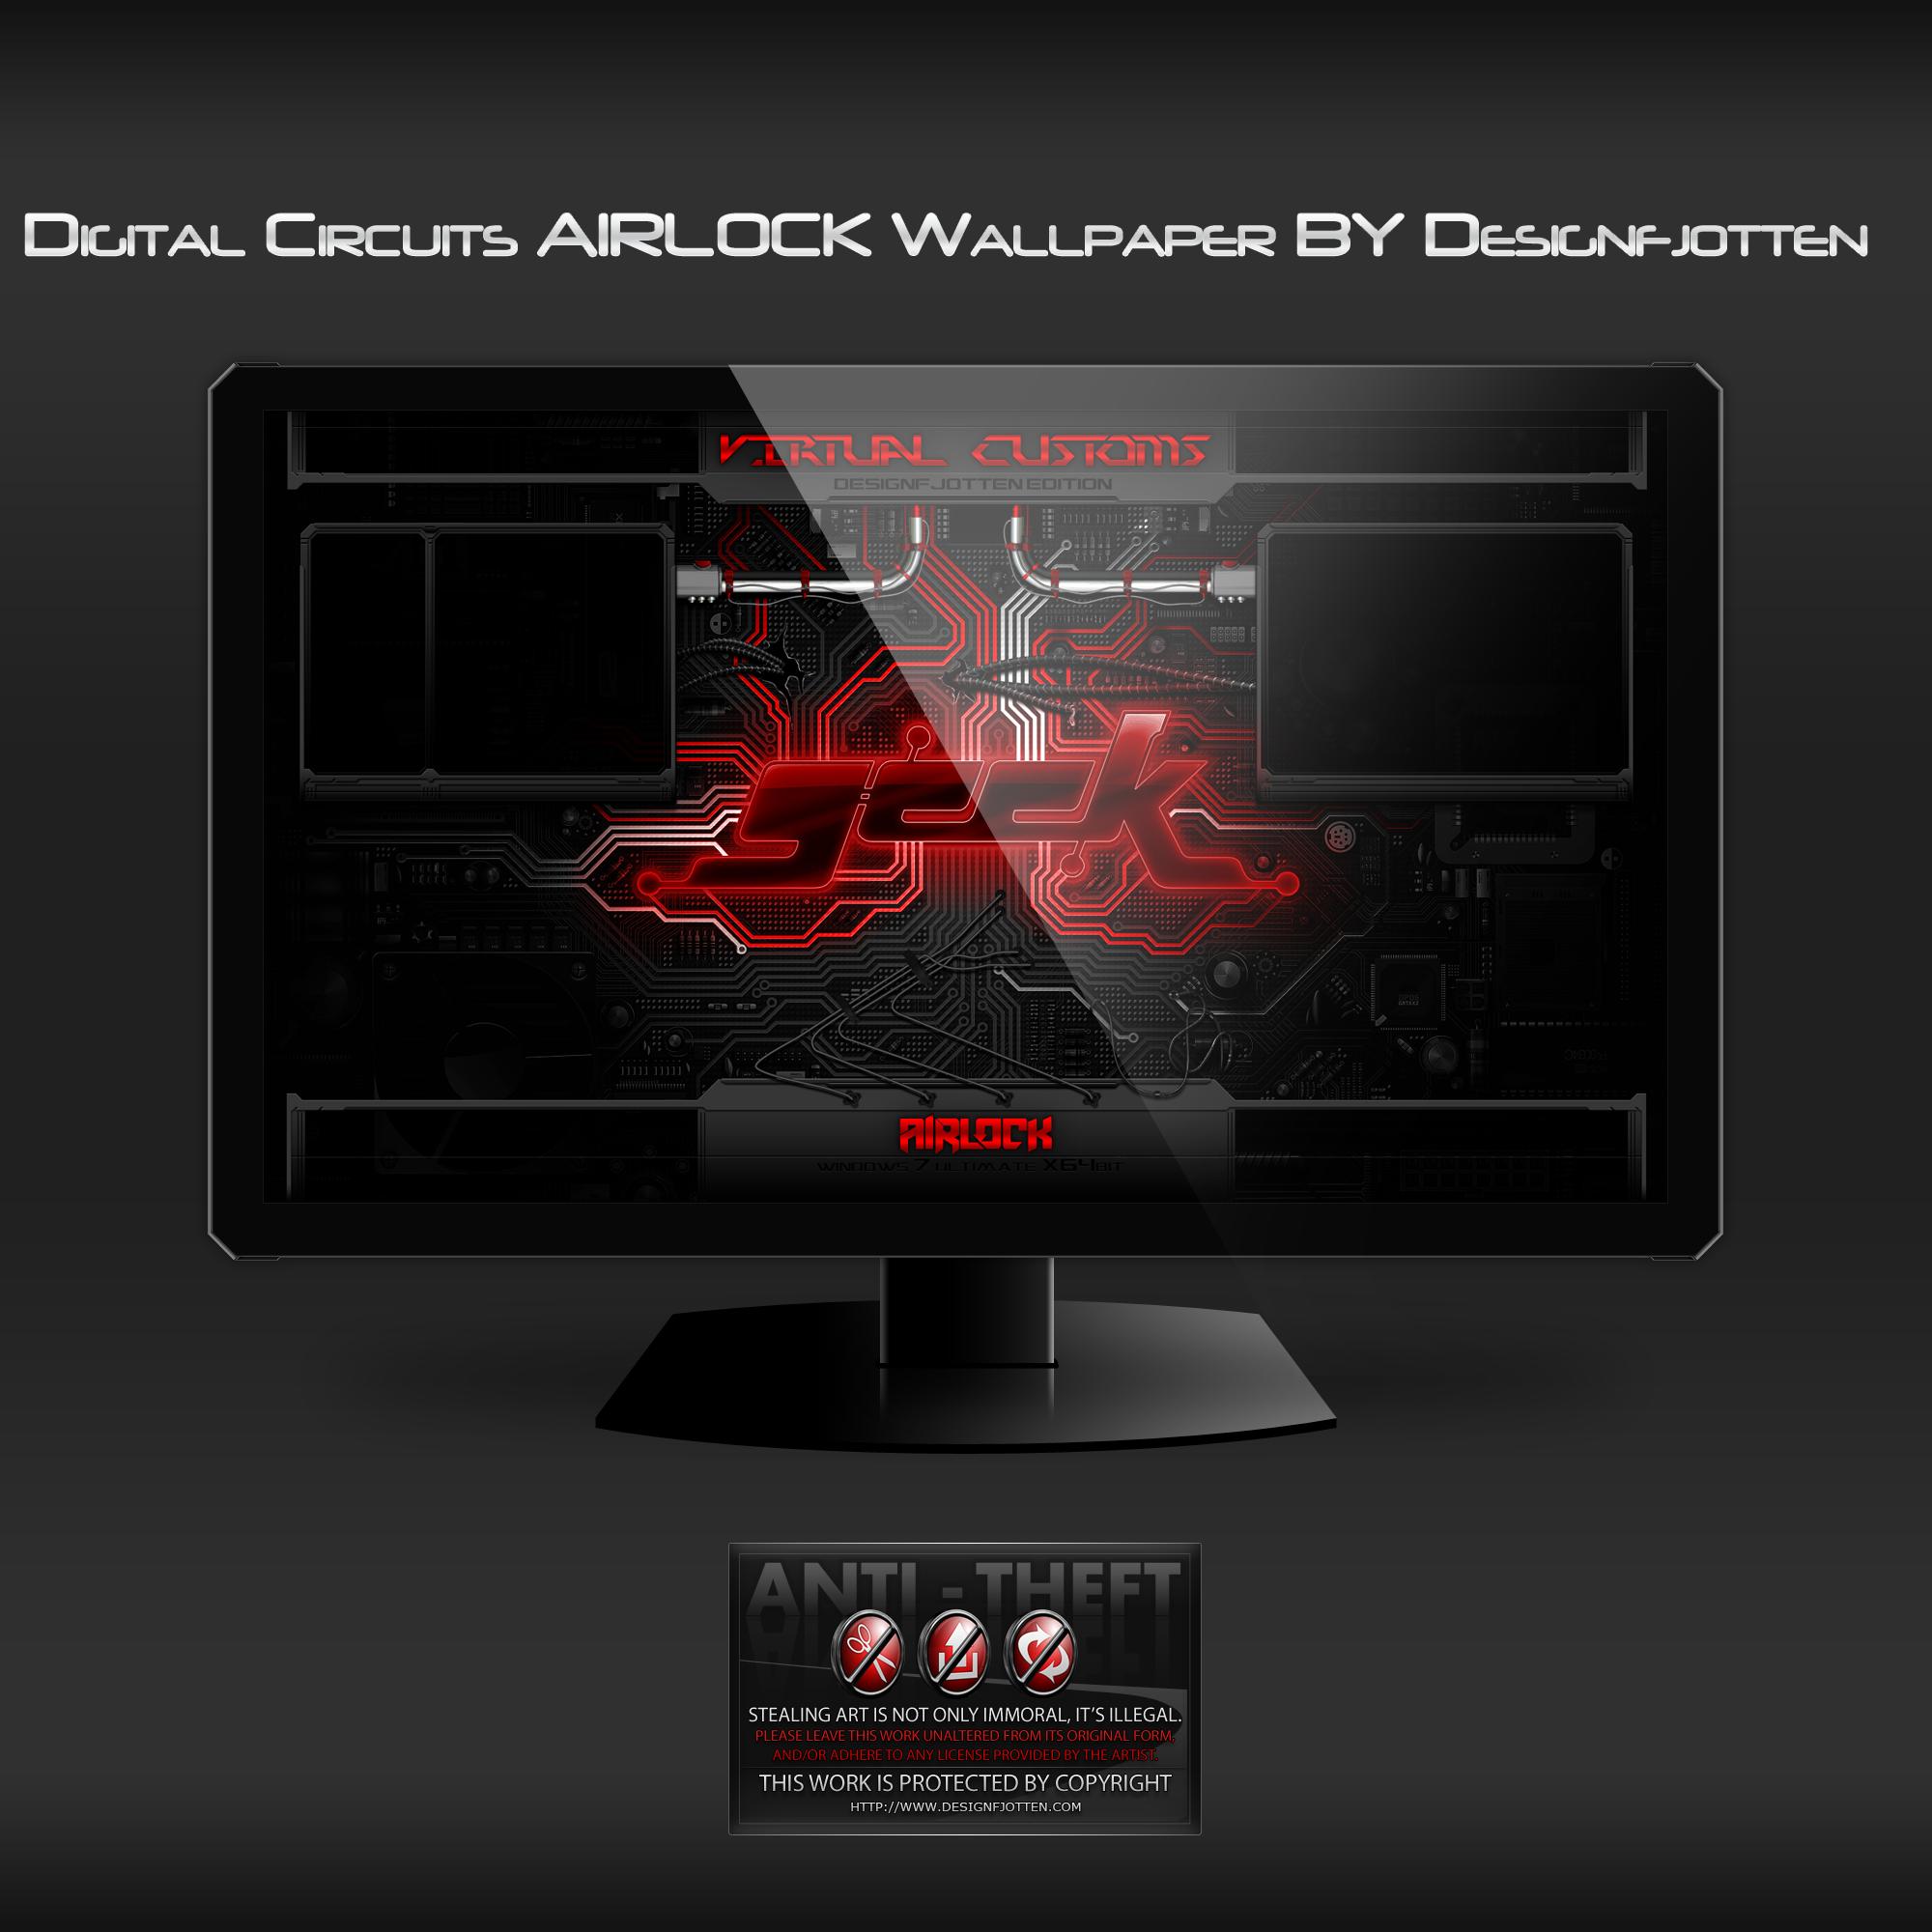 Digital Circuits AIRLOCK wallpaper by Designfjotten